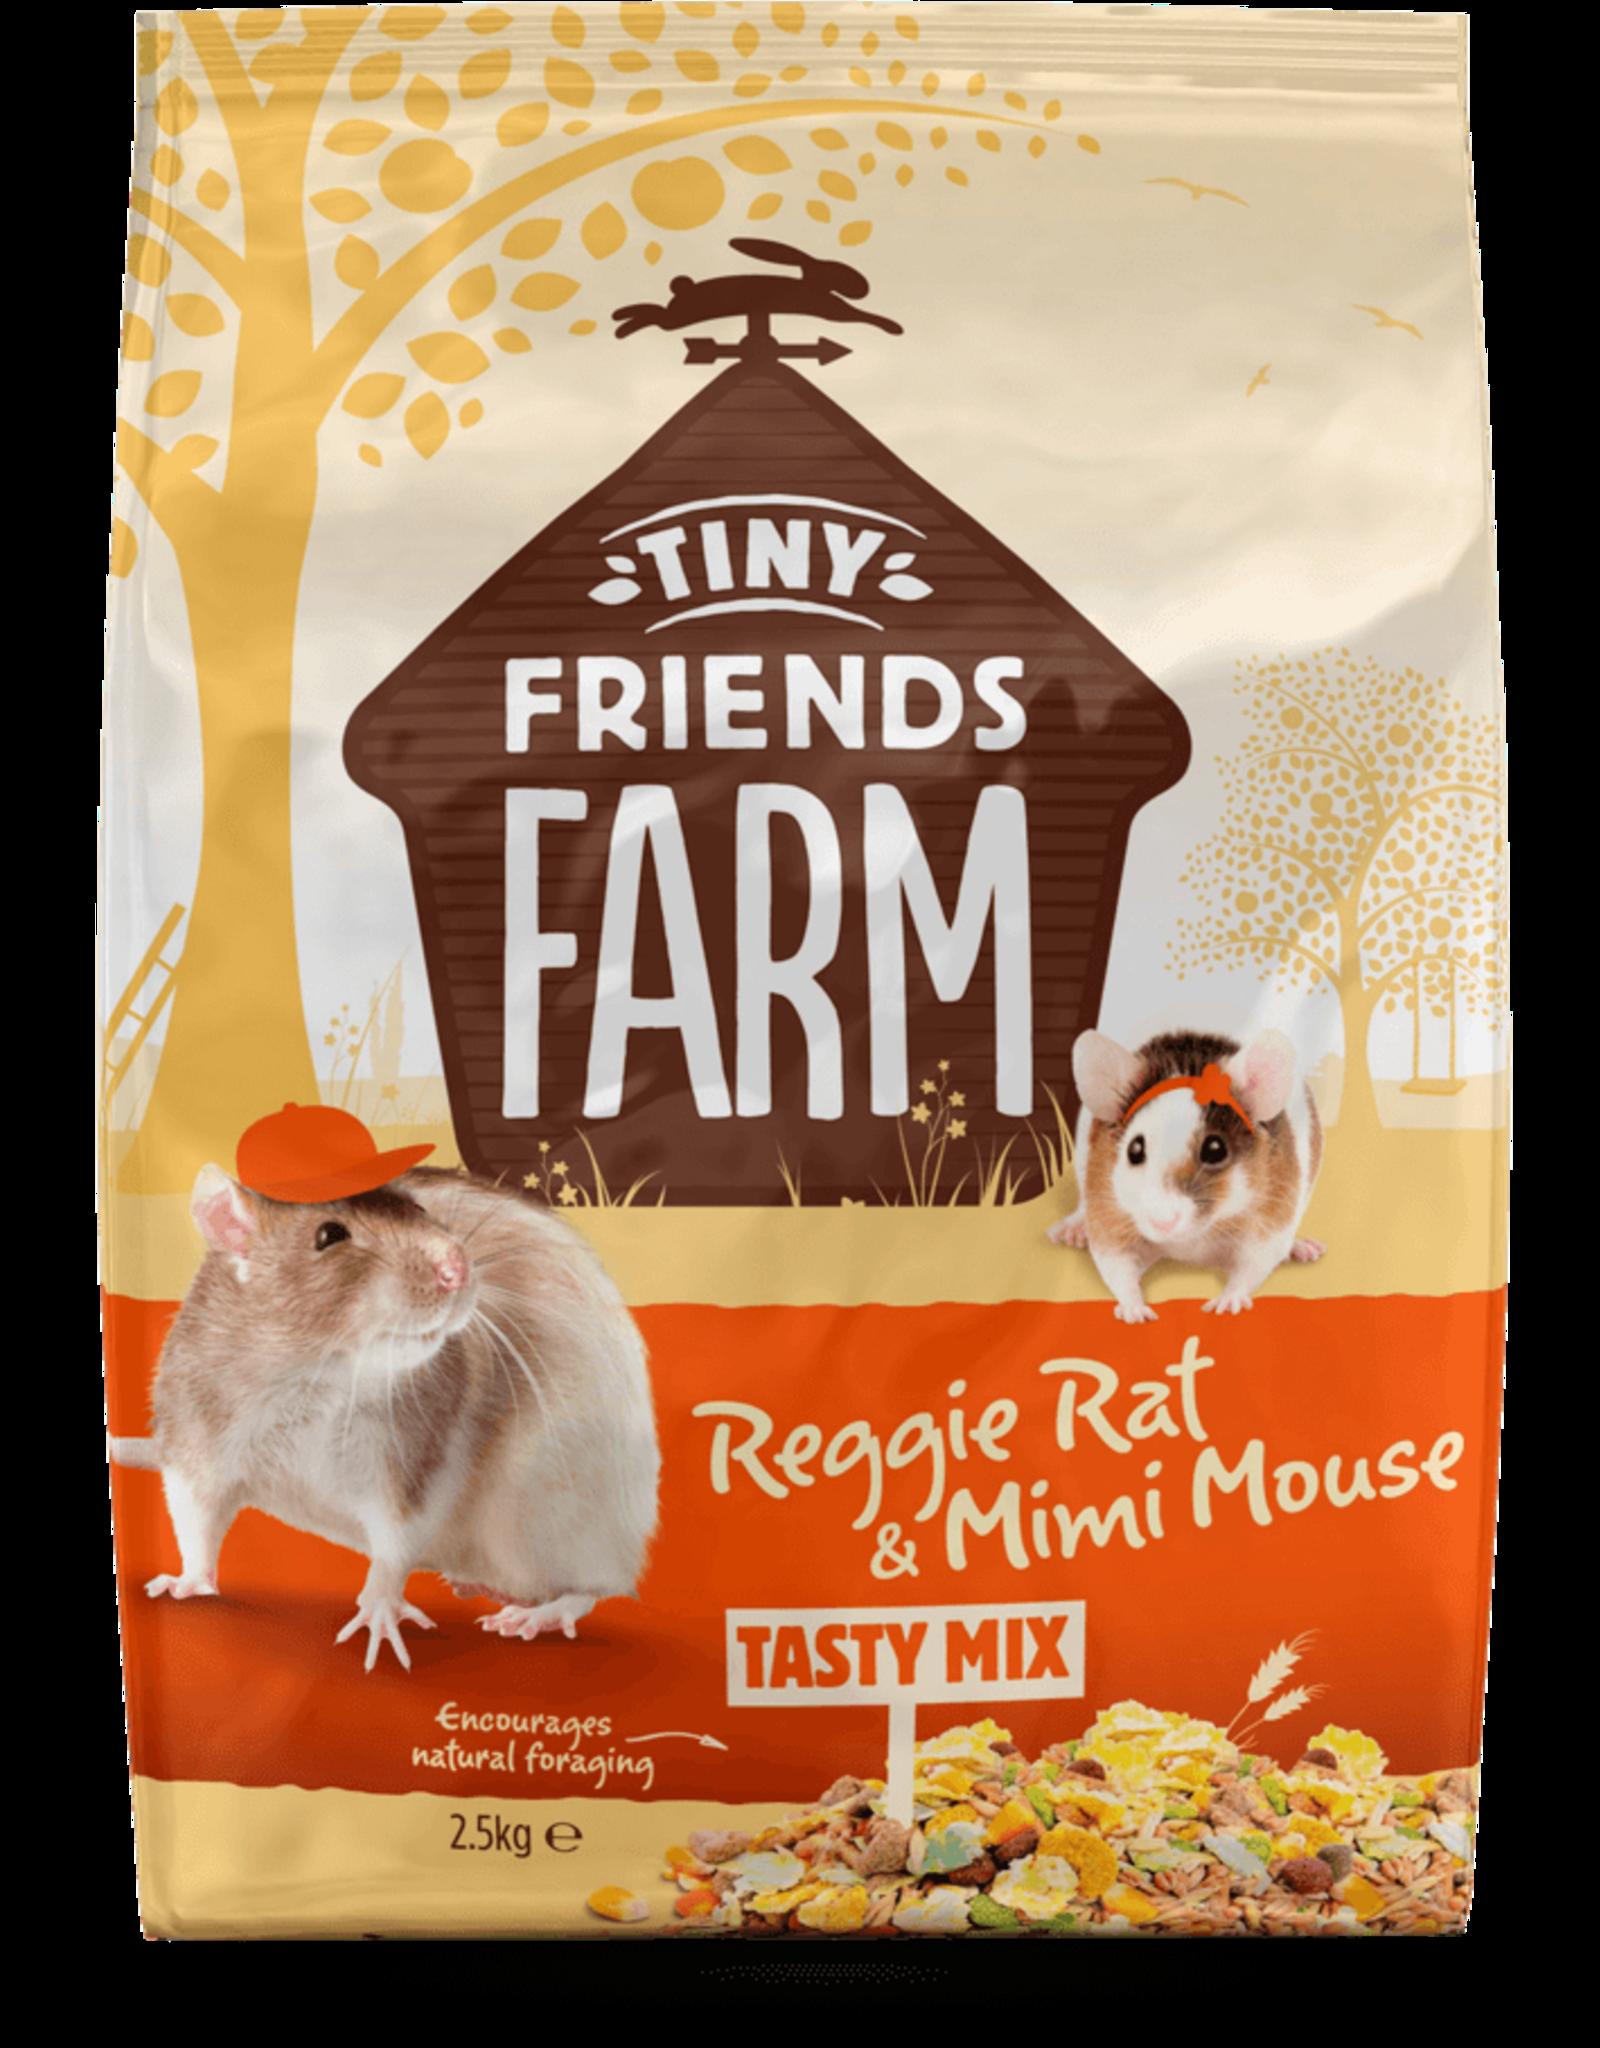 Supreme Pet Foods TINY FRIENDS FARM Reggie Rat & Mimi Mouse Tasty Mix 907g